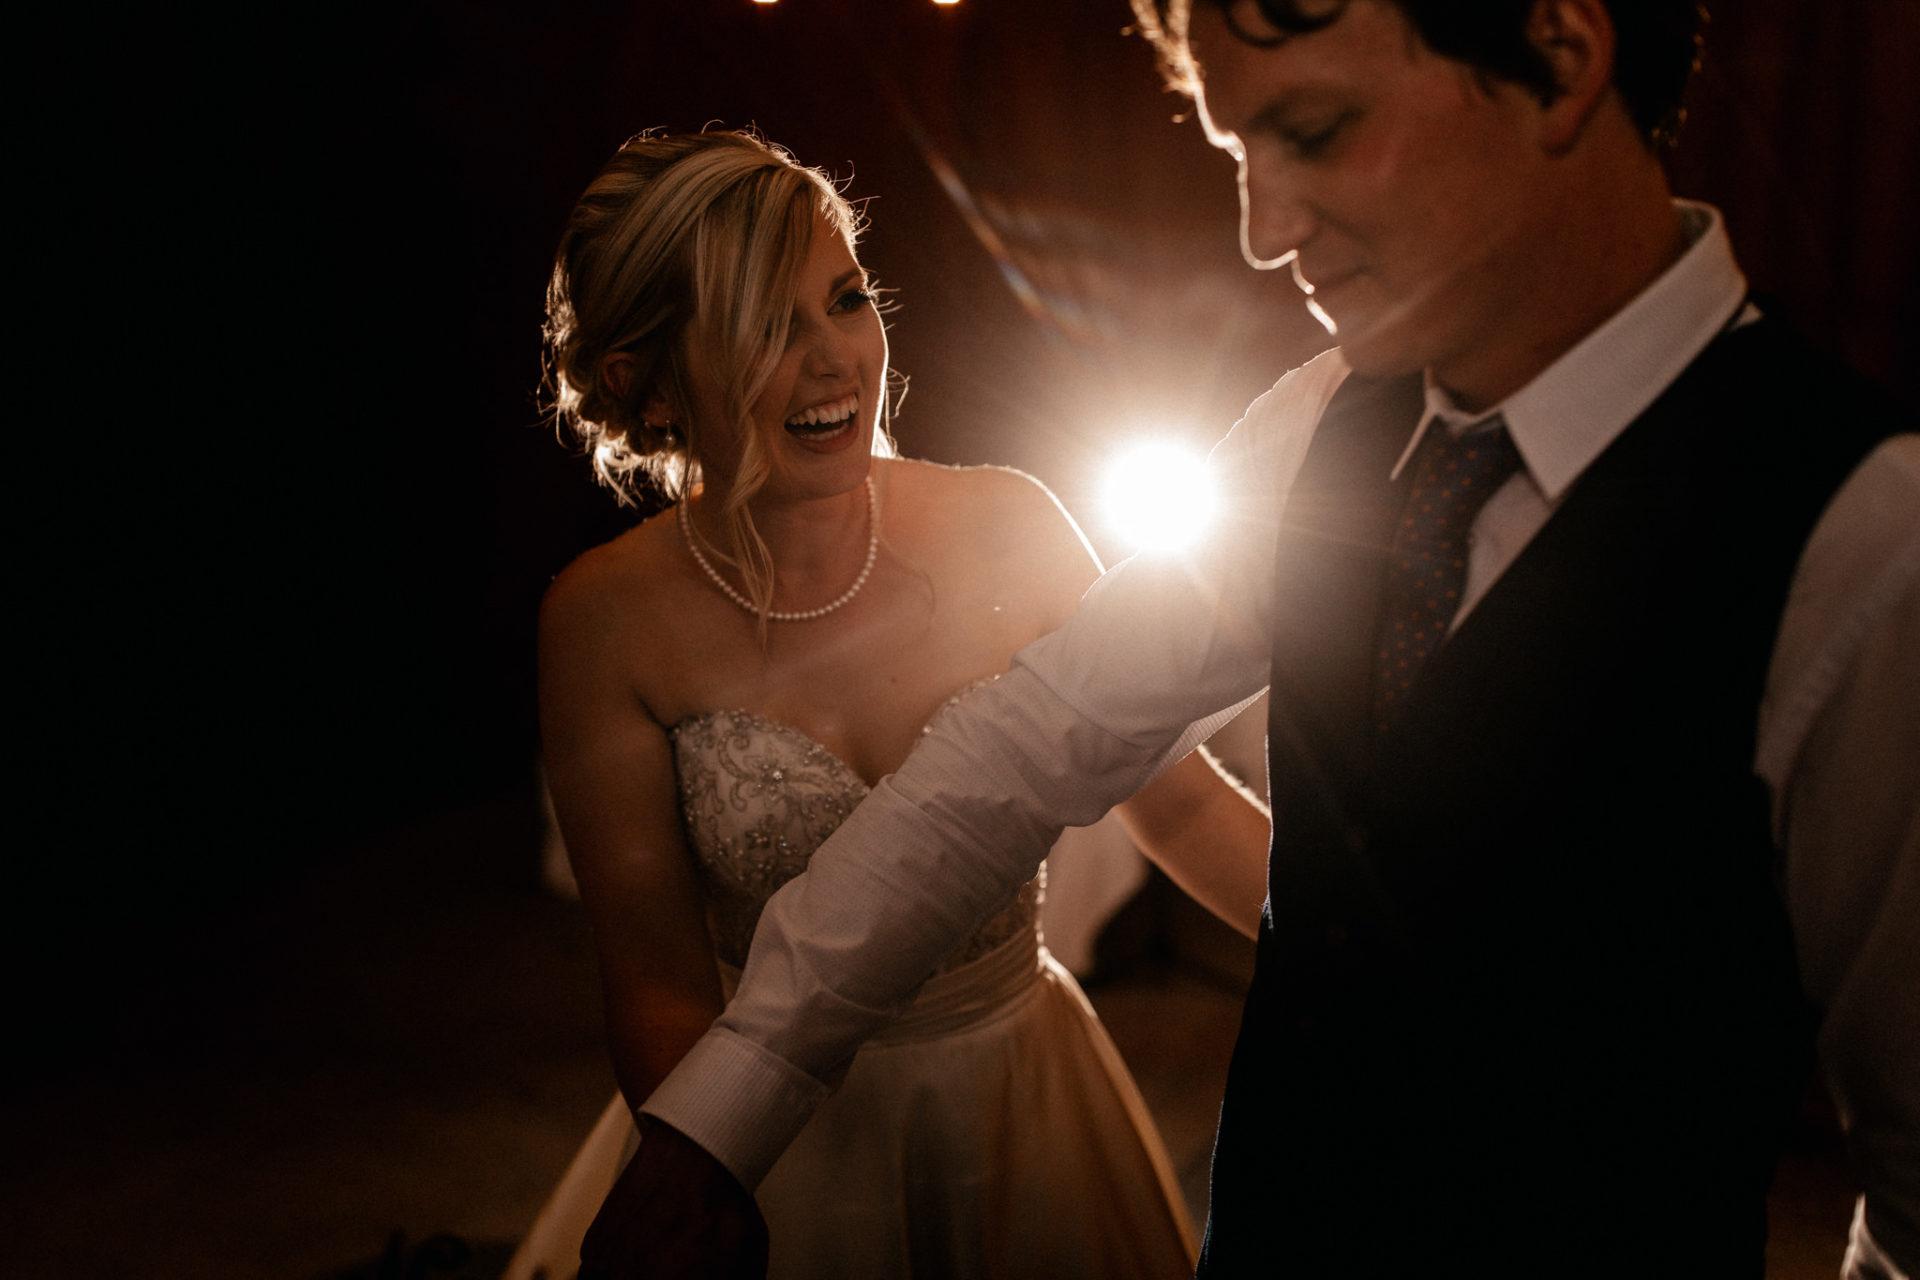 backyard-wedding-australia-melbourne-cake-cutting-bride-groom